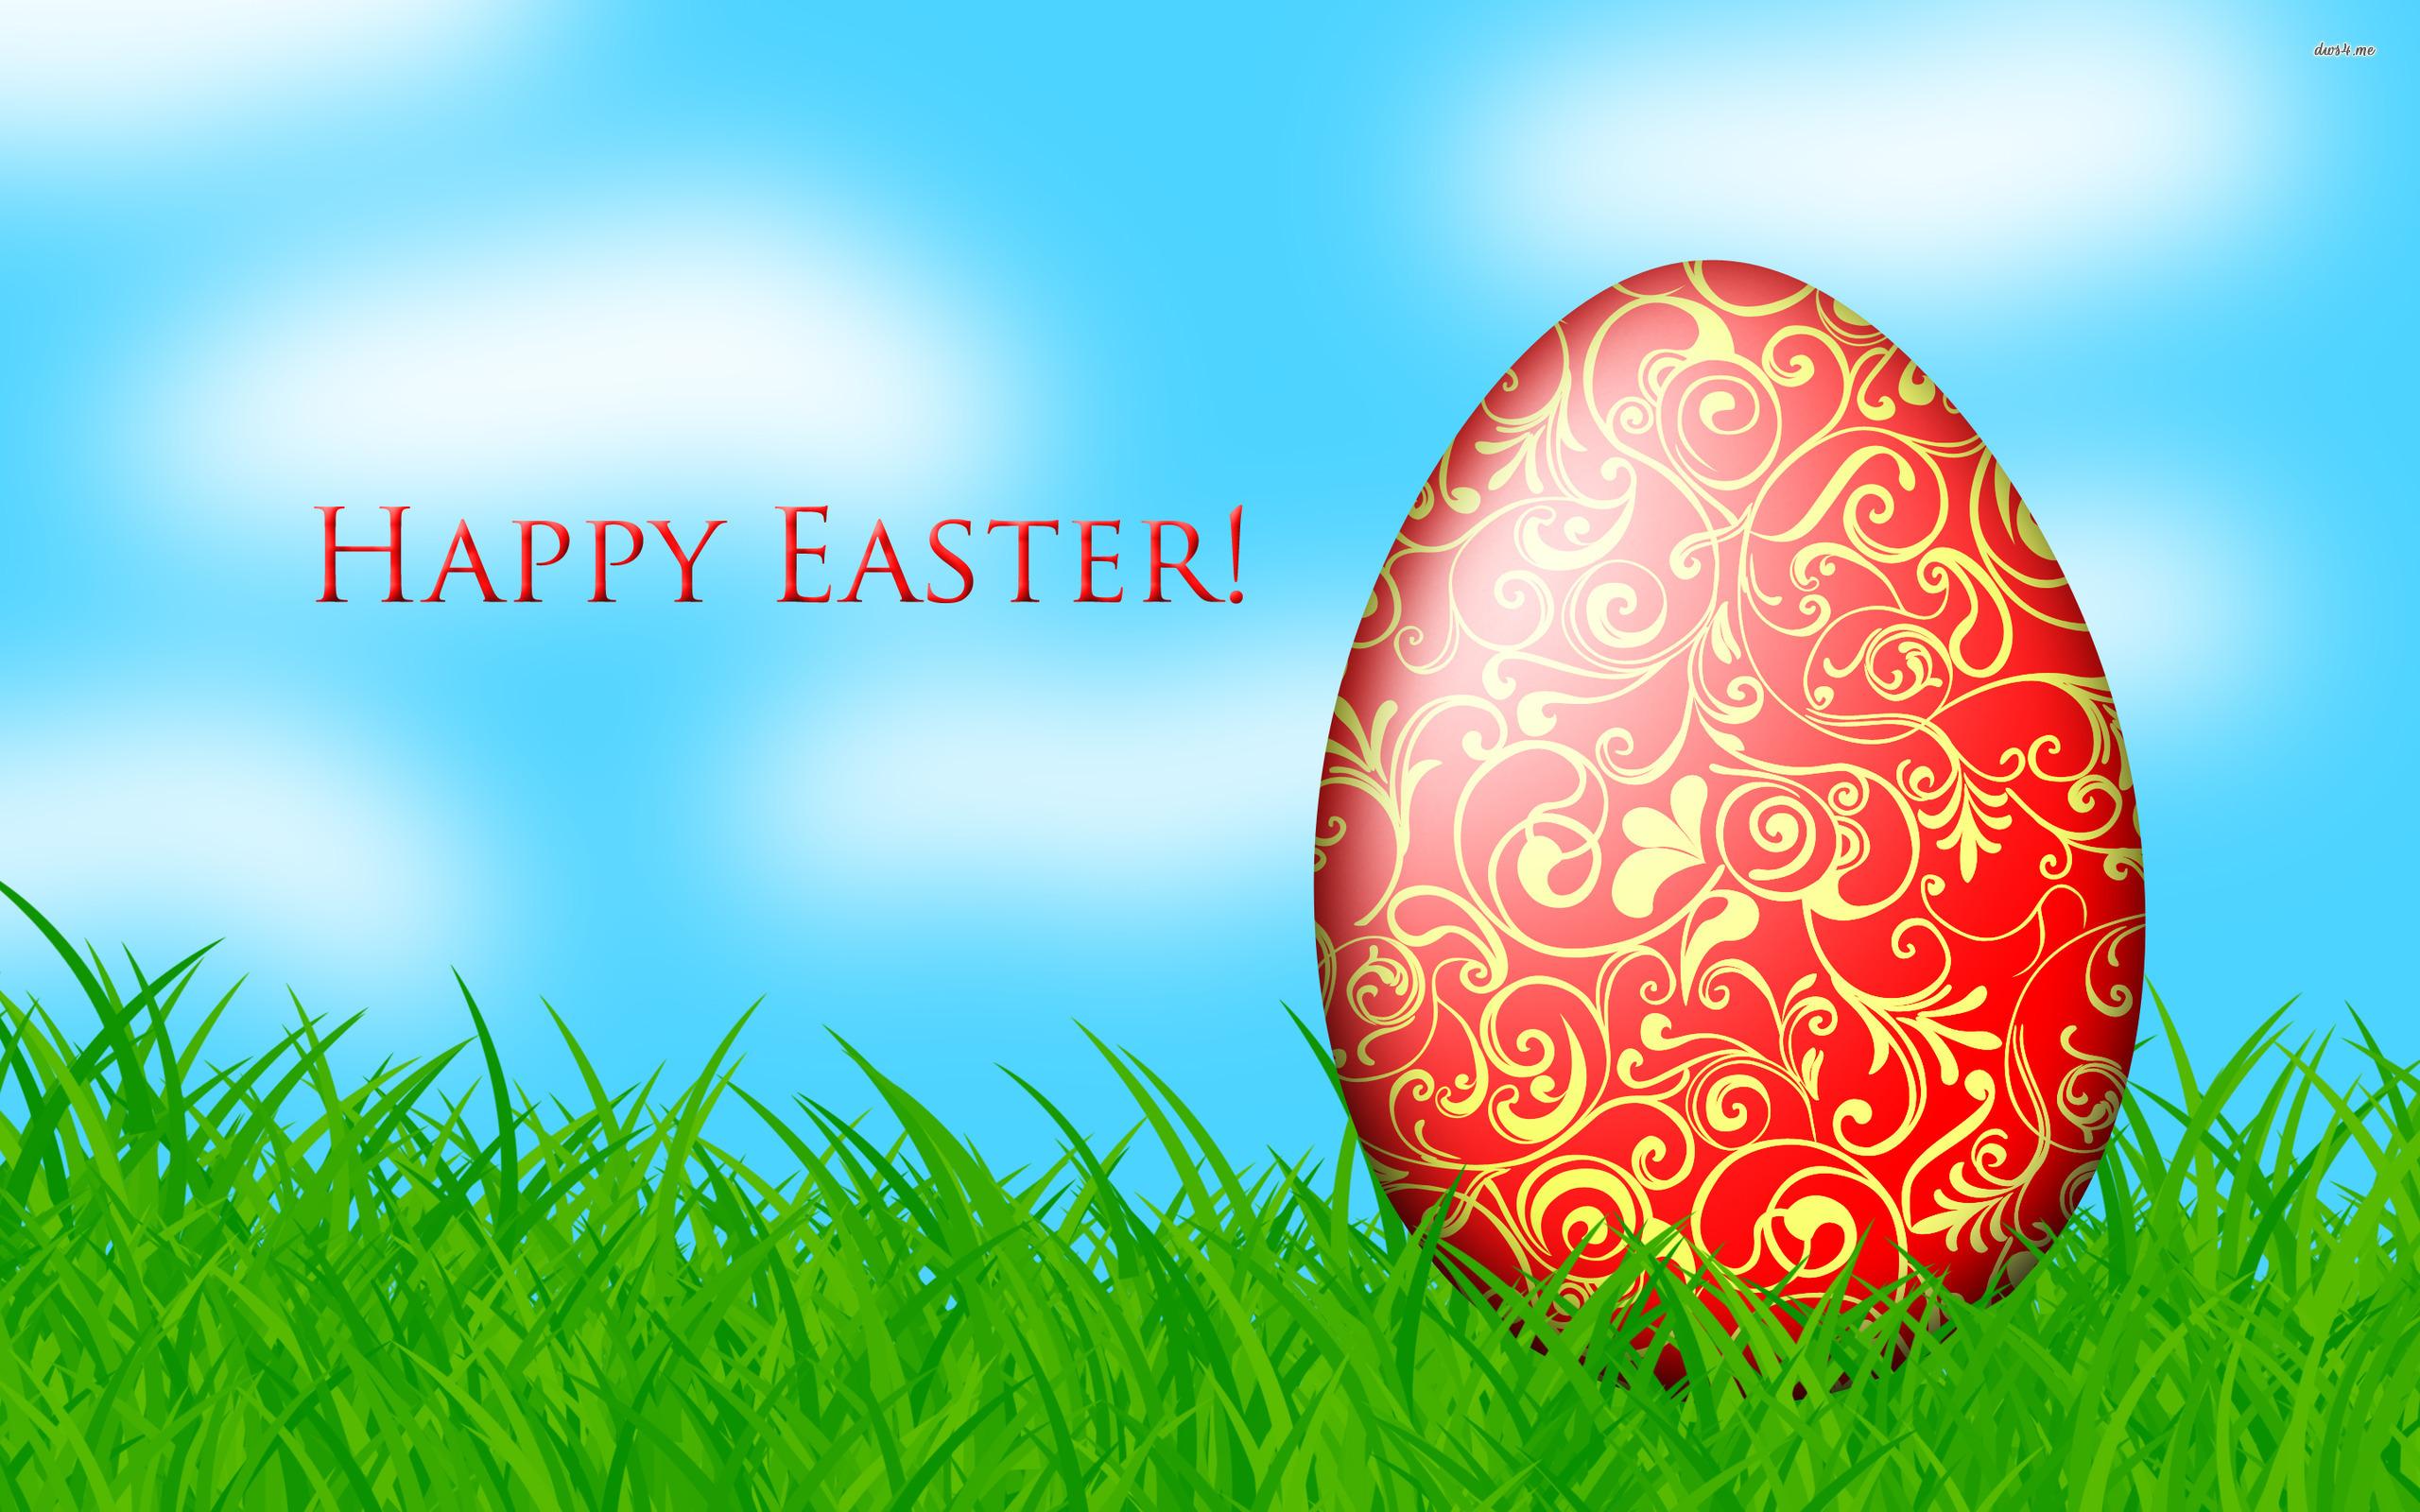 Easter HD Wallpaper